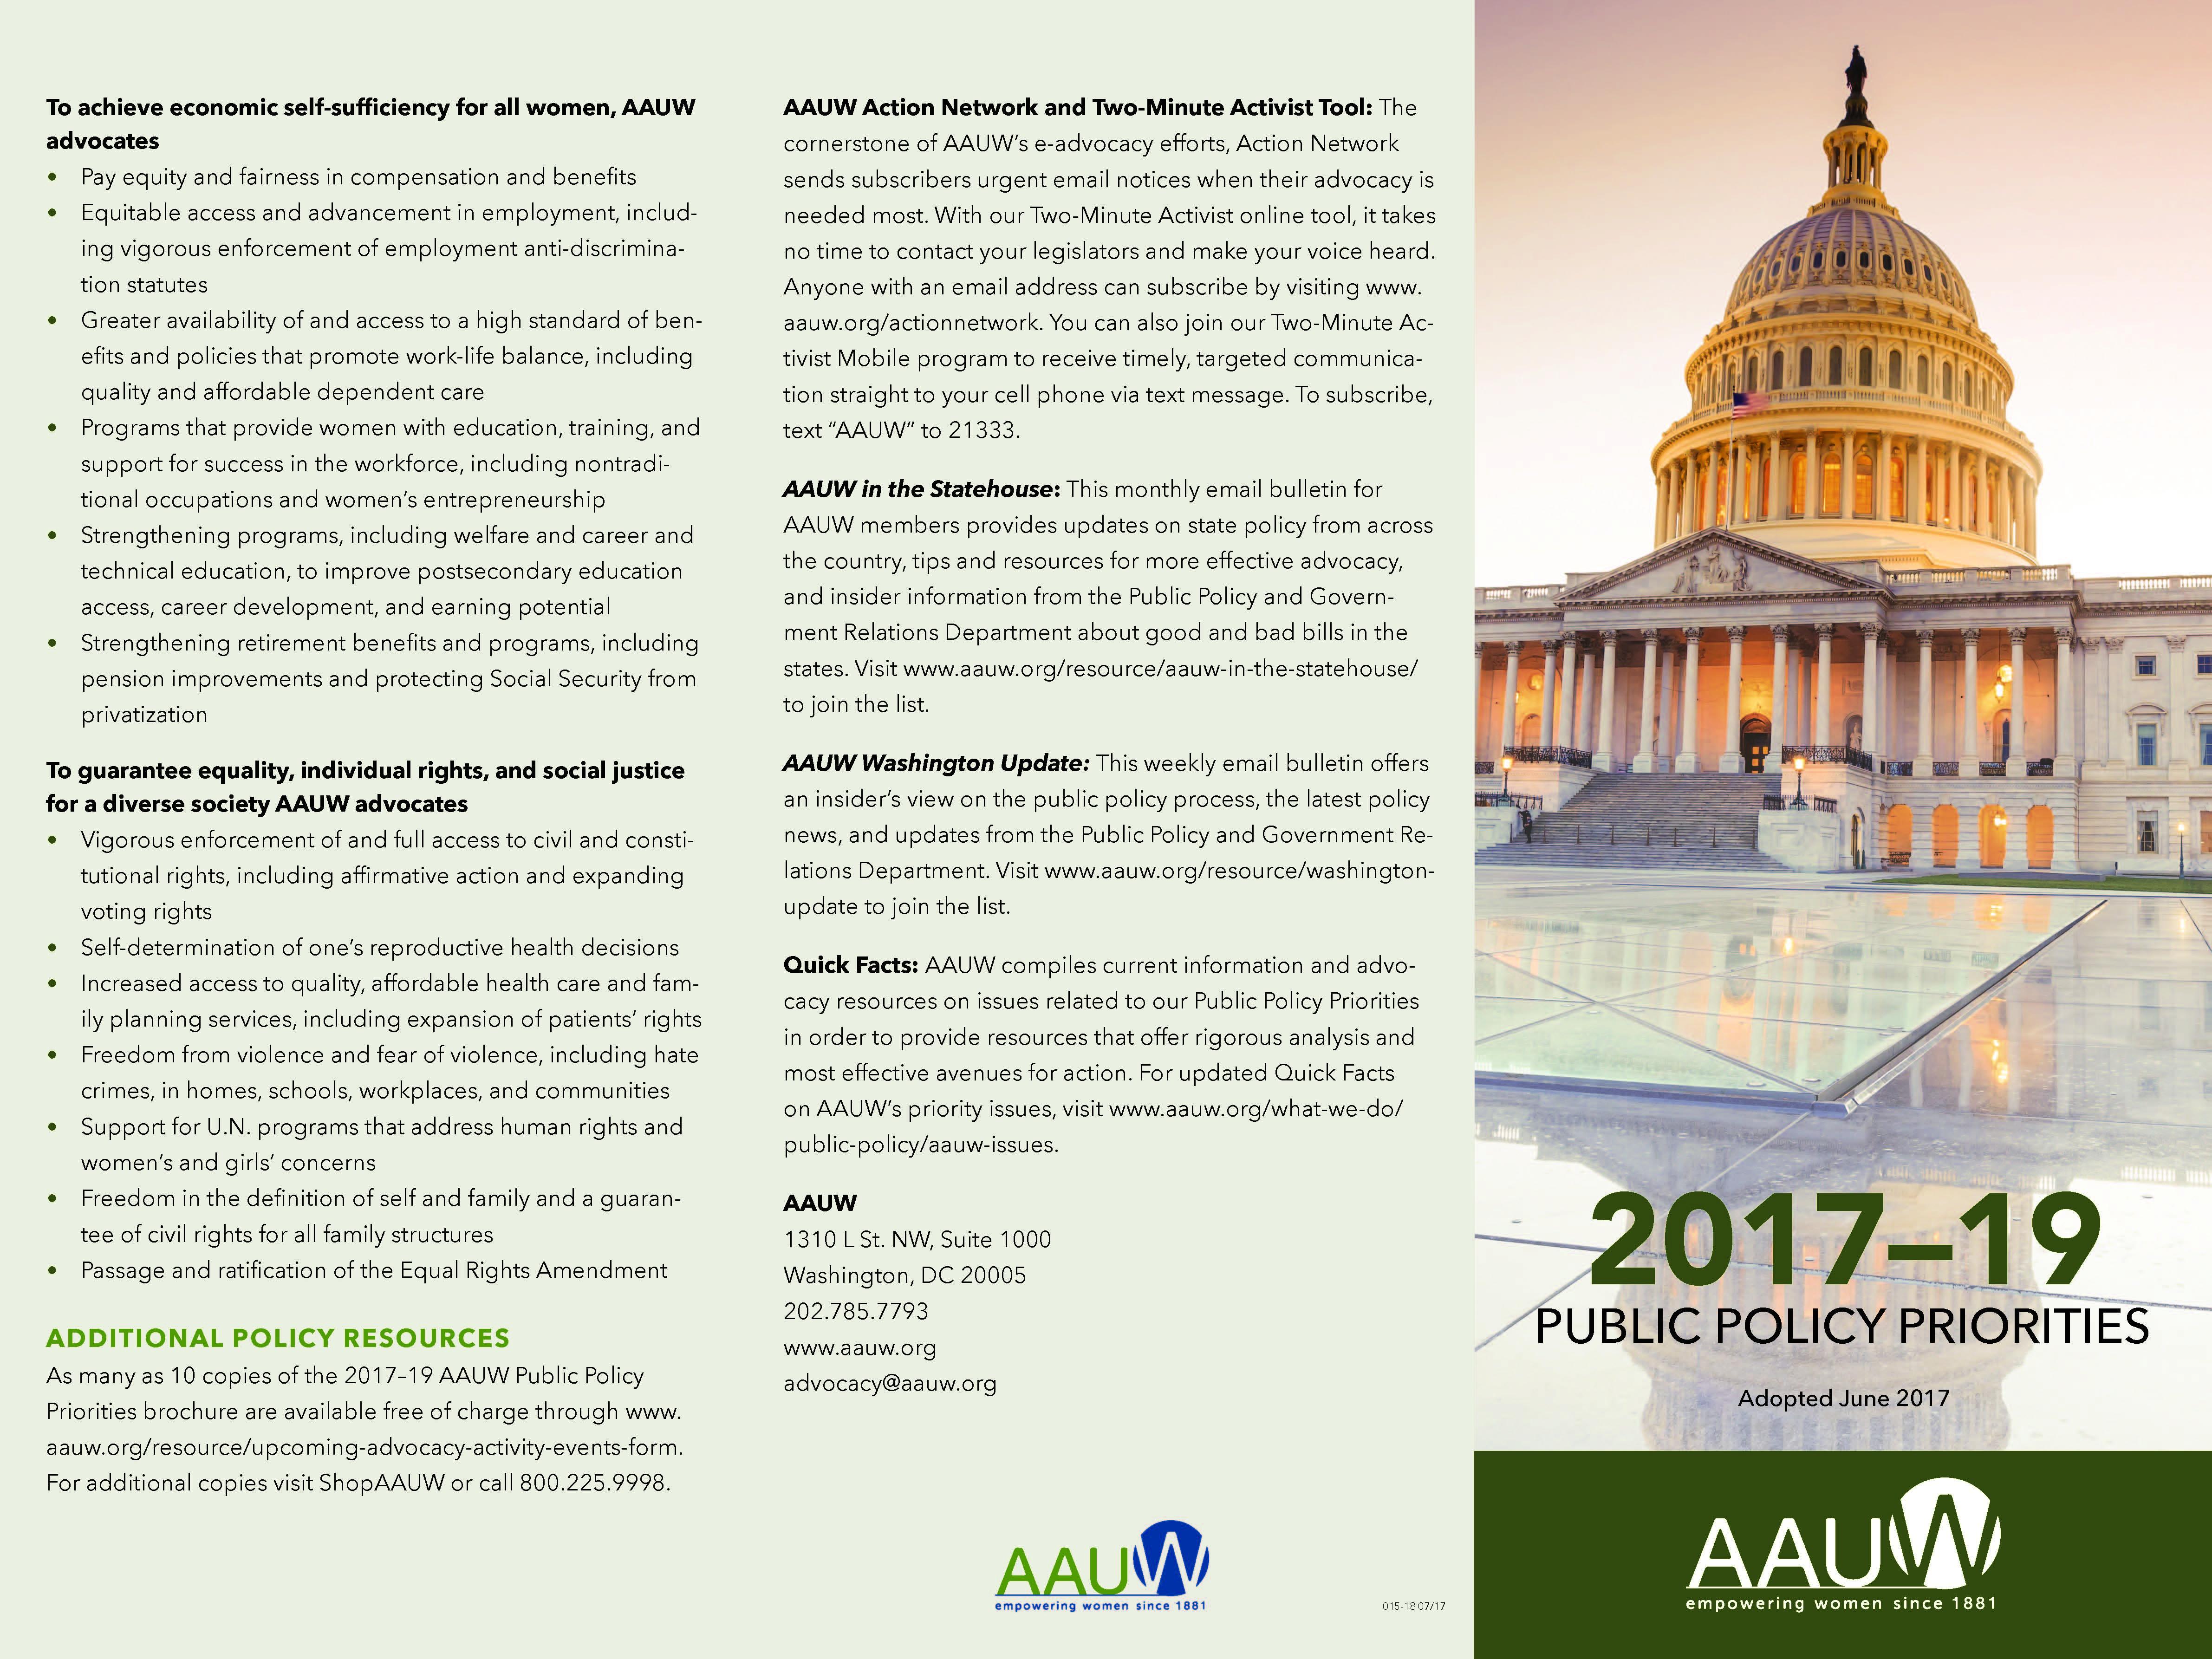 Download a copy of the public policy program brochure (PDF)